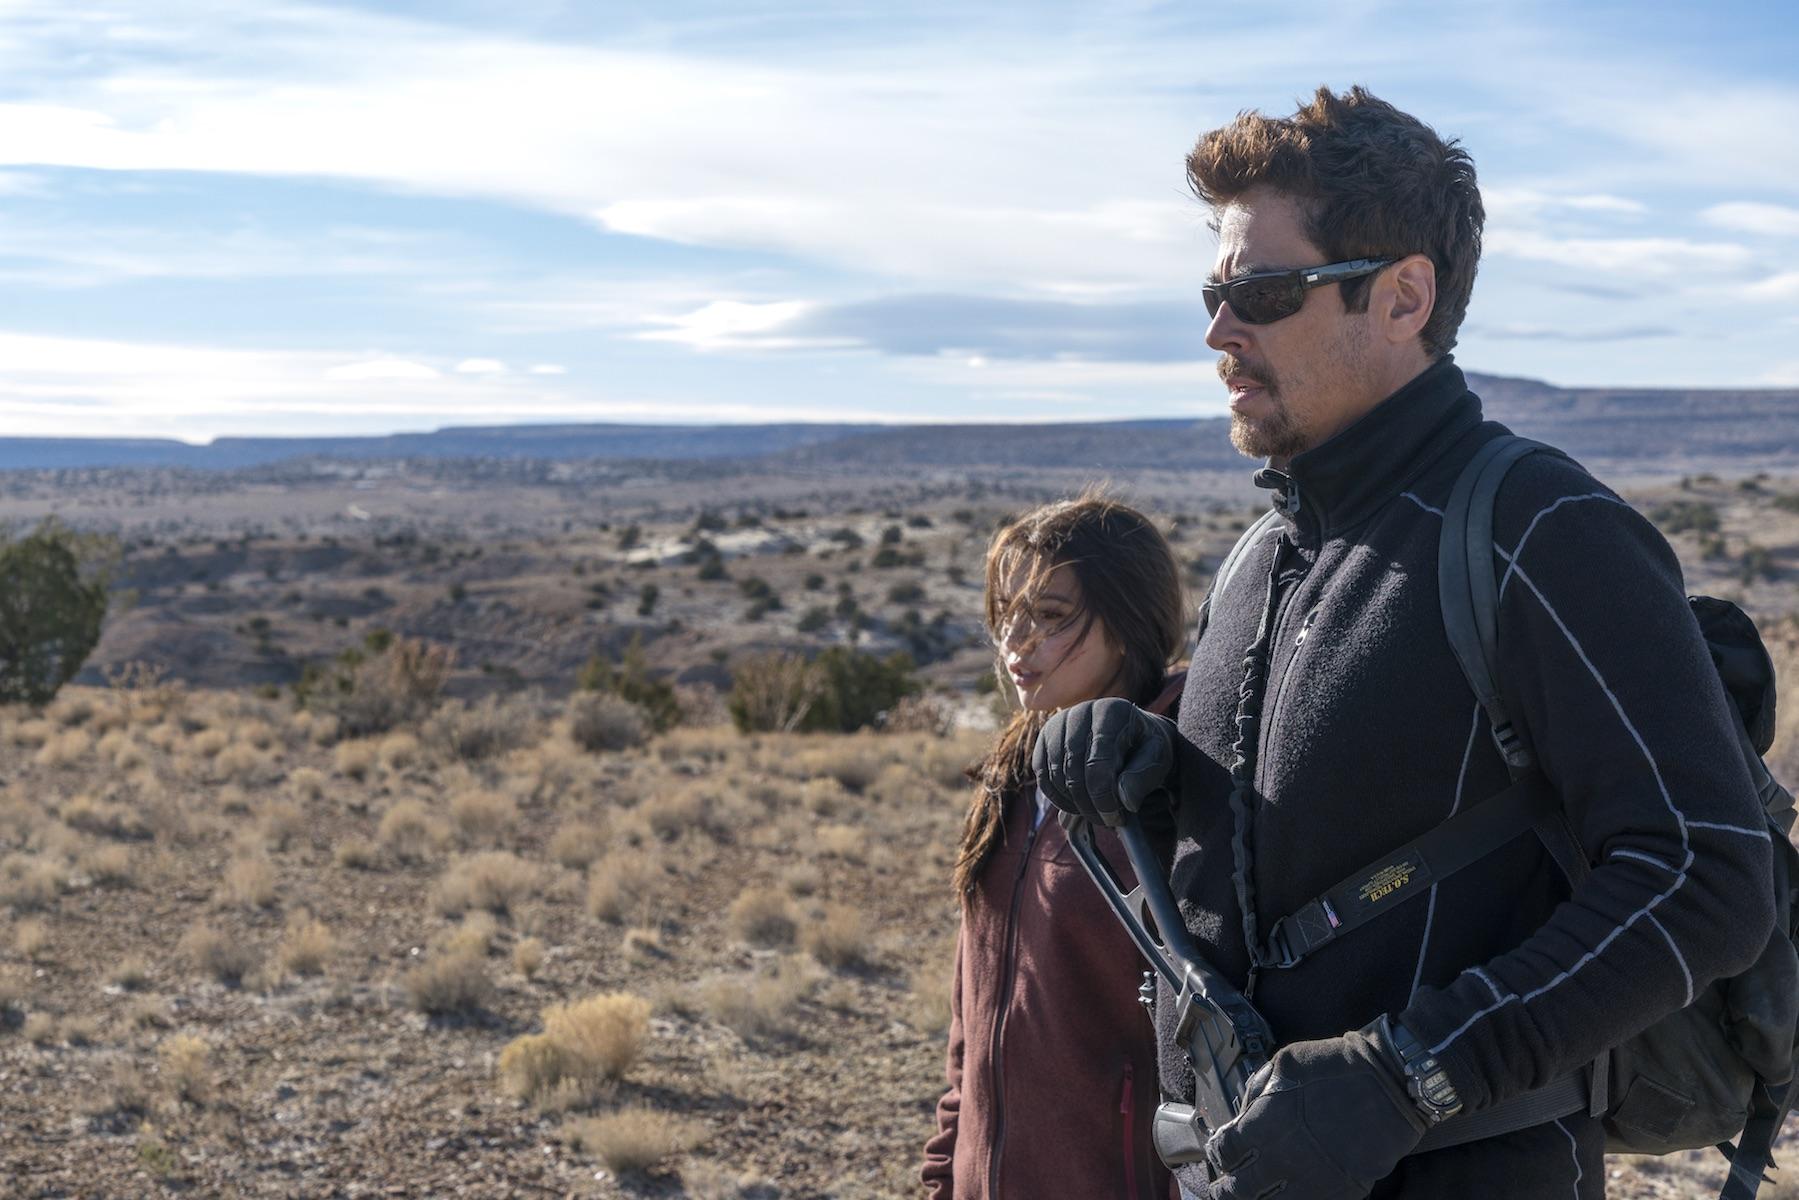 Benicio Del Toro and Isabela Moner return for Sicario: Day of the Soldado.